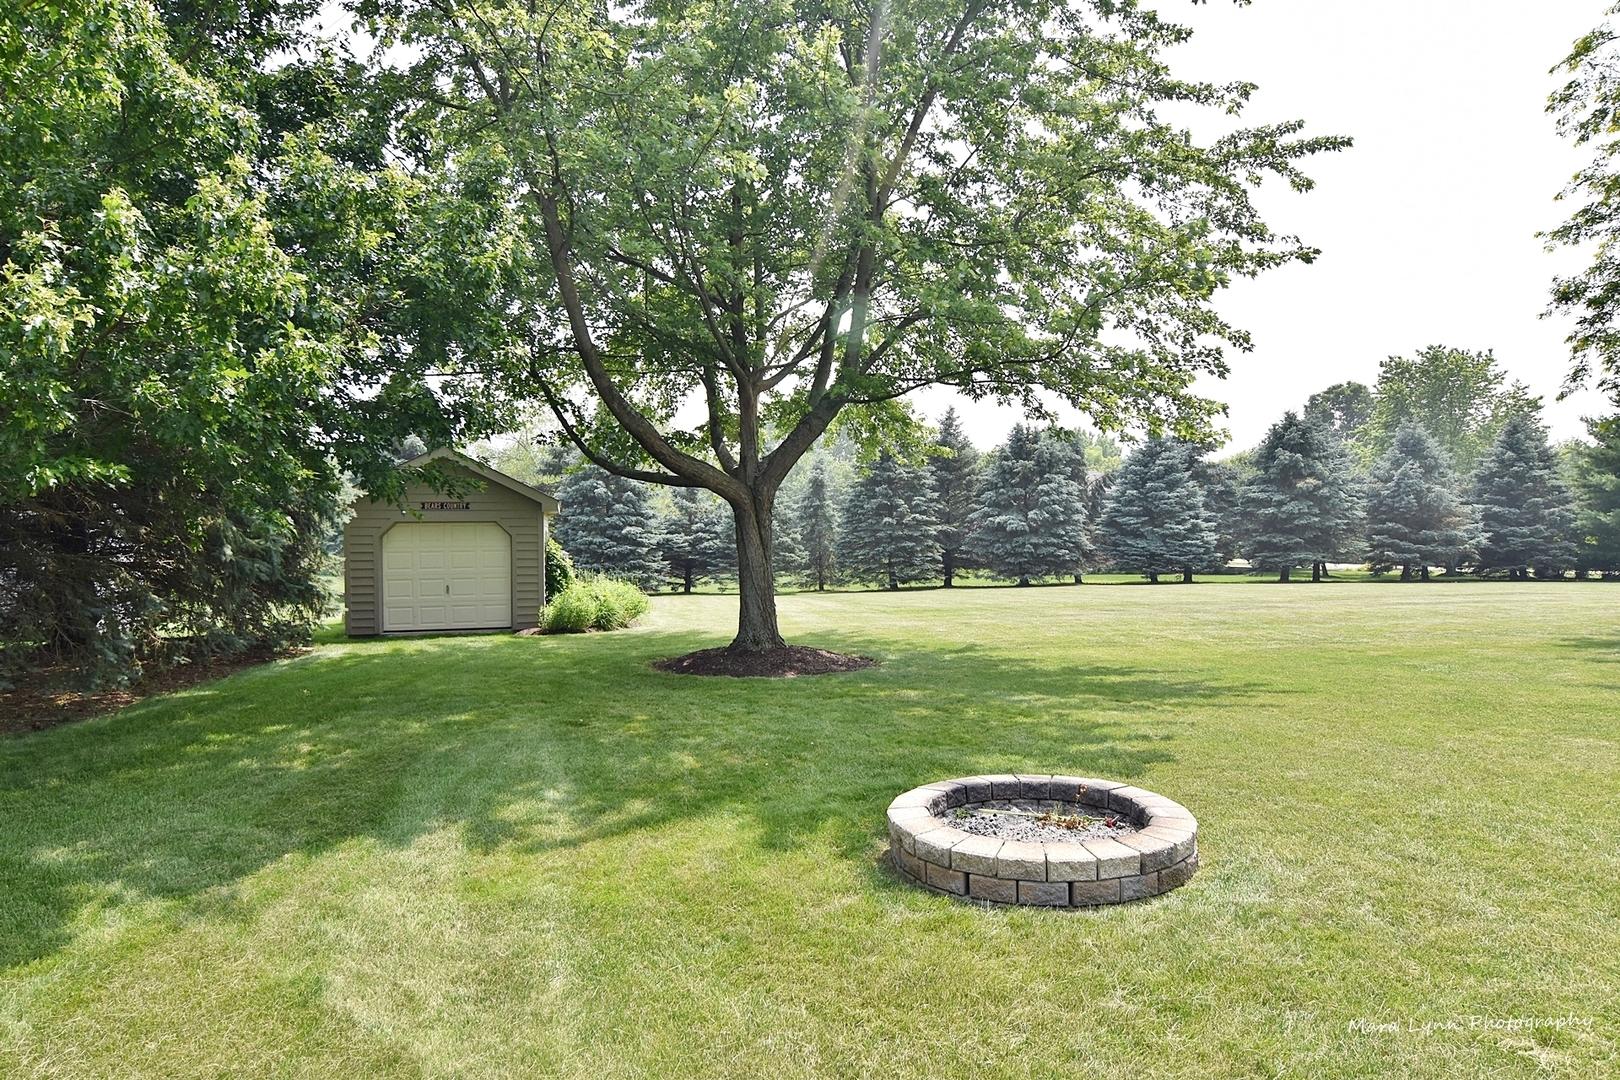 43W349 Beaver, ST. CHARLES, Illinois, 60175